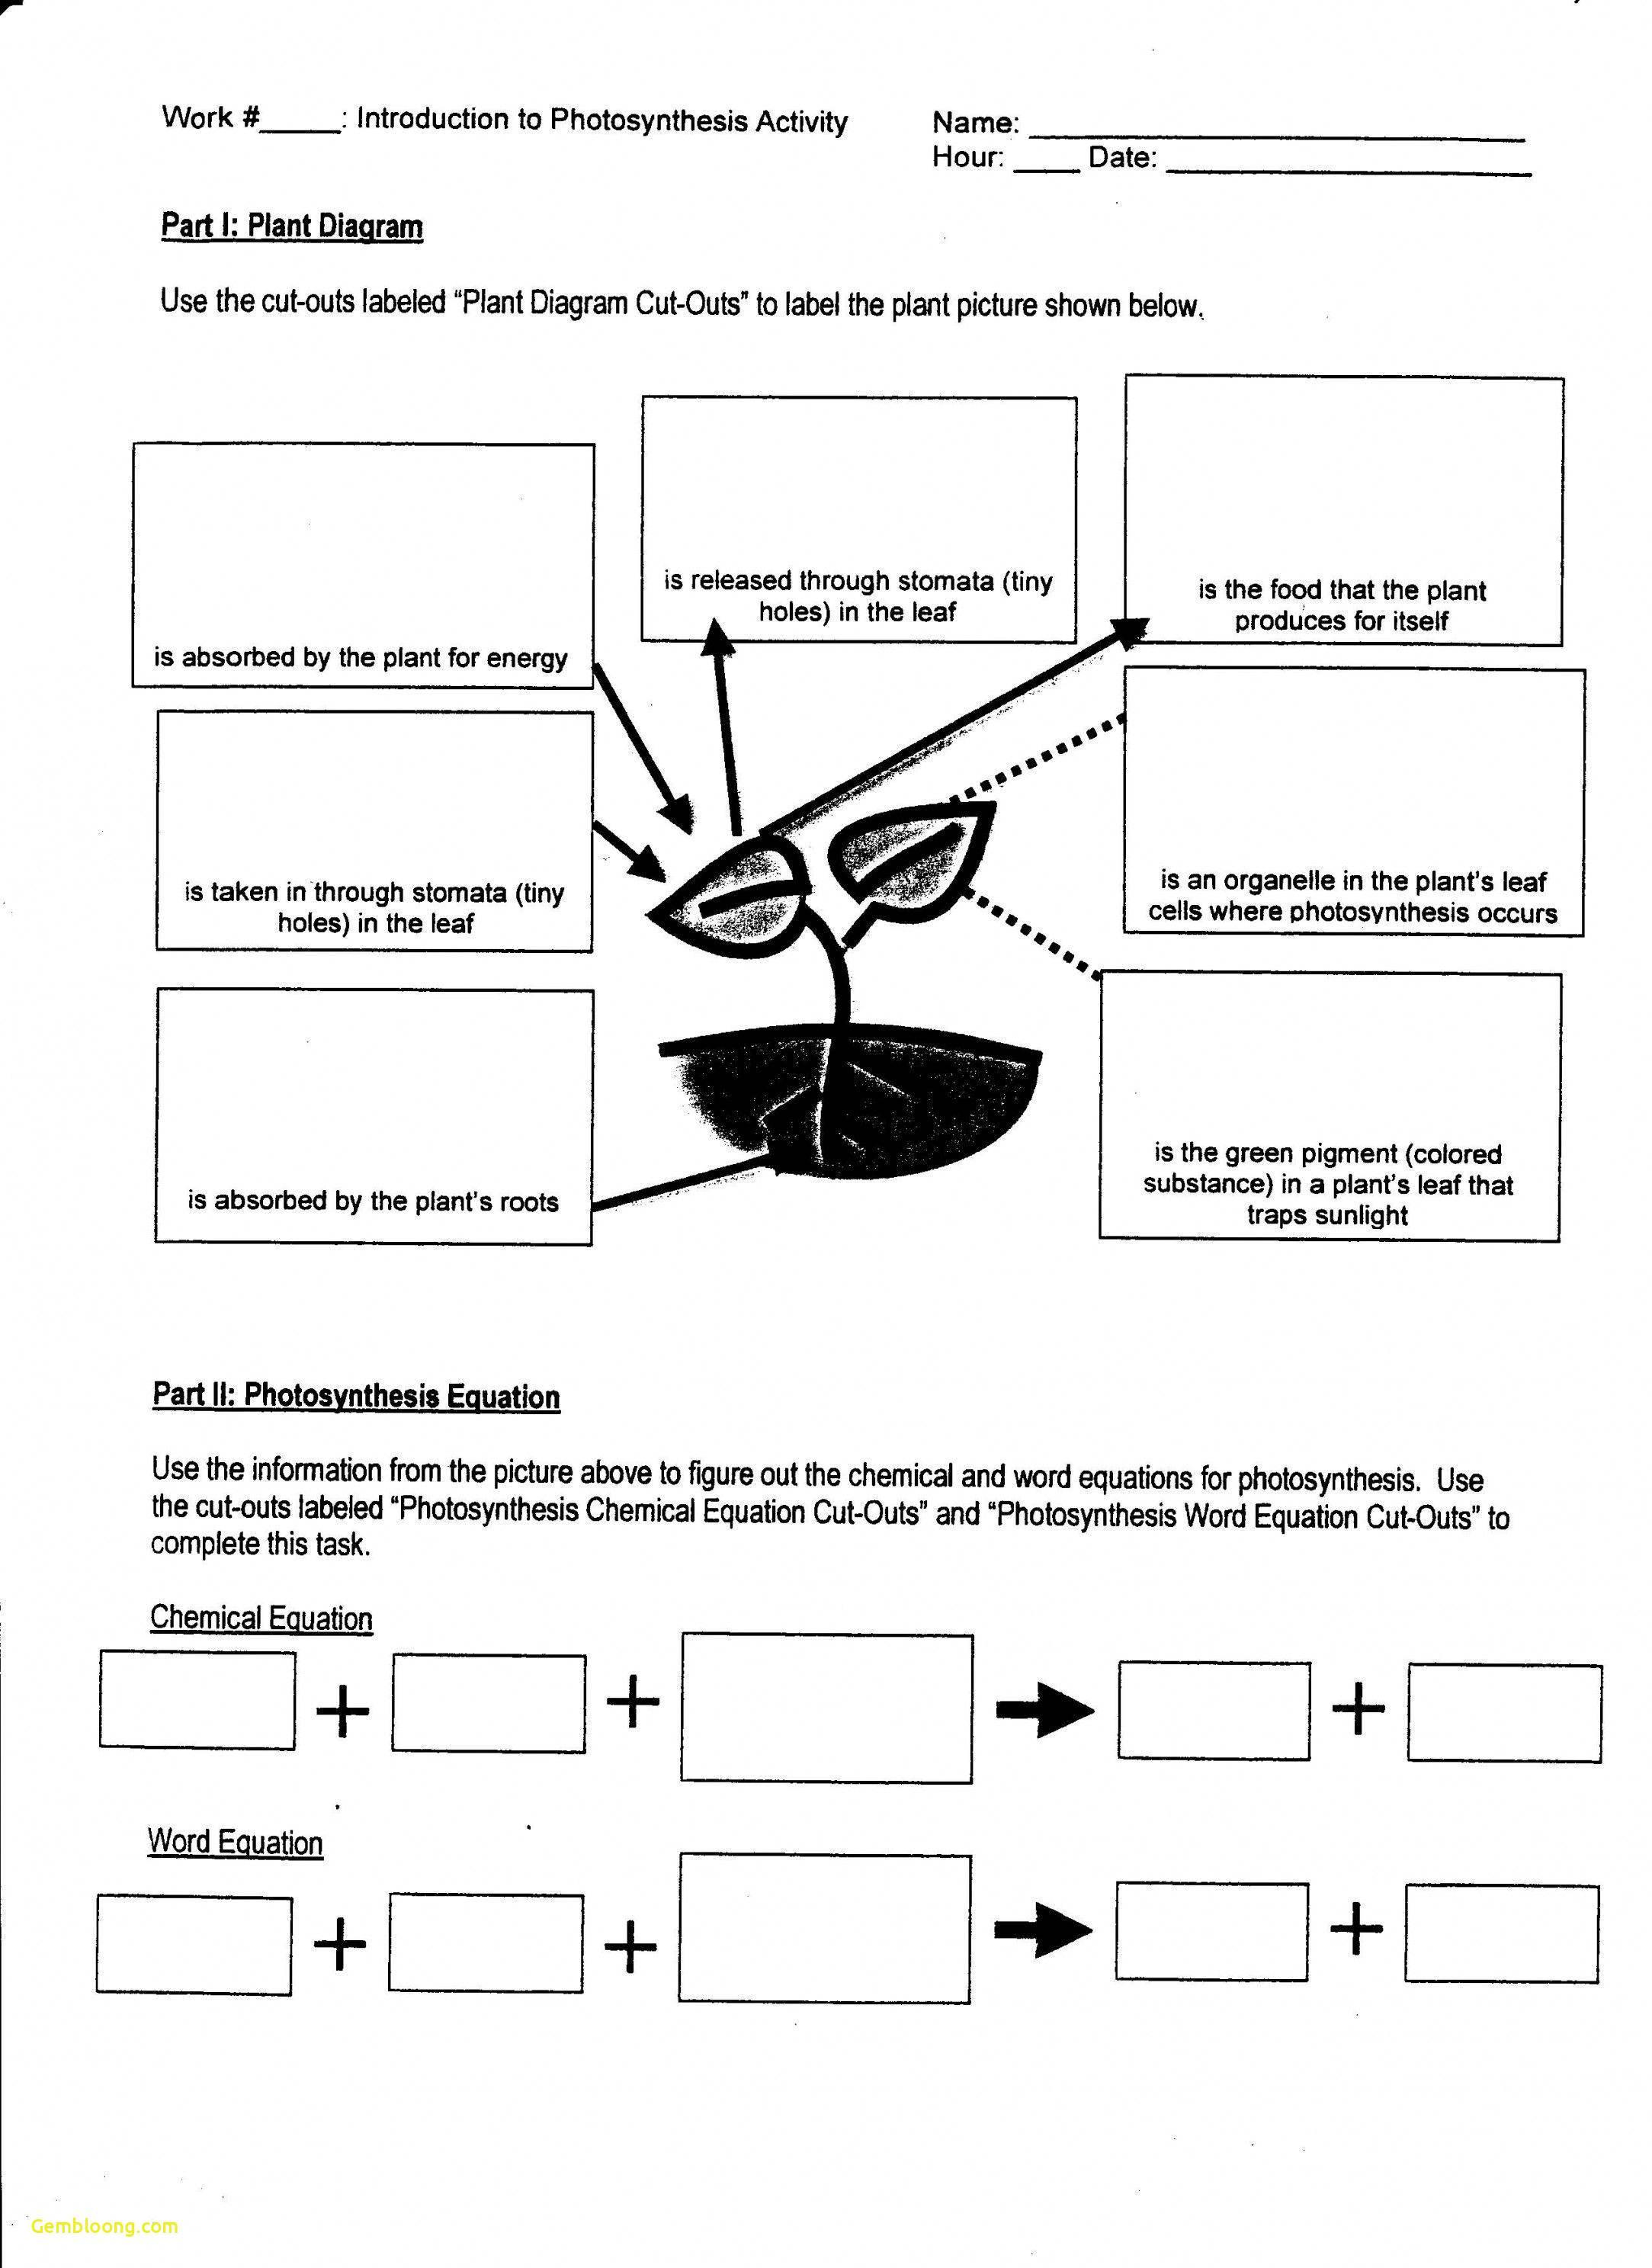 Photosynthesis Worksheet High School — db excel.com